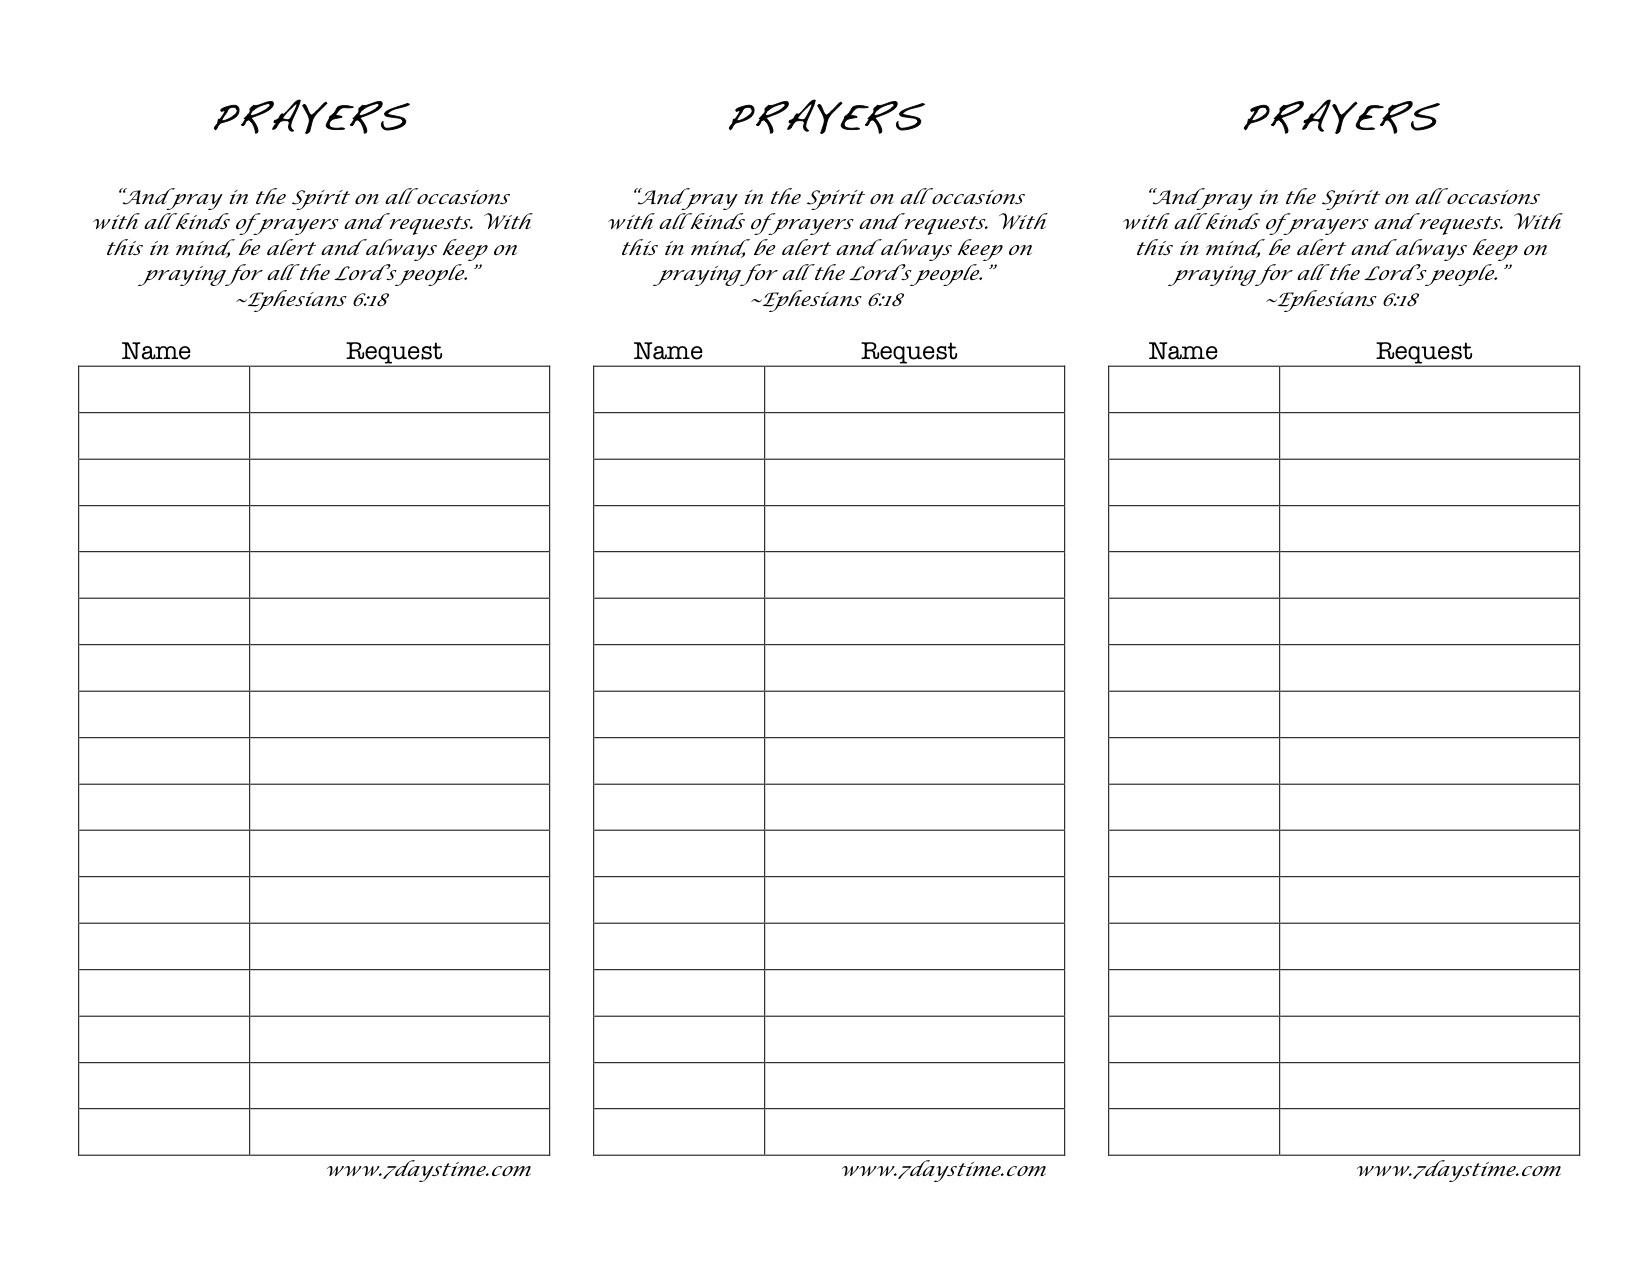 Prayer Card Template Elegant Printable Prayer Request Form Template - Free Printable Prayer List